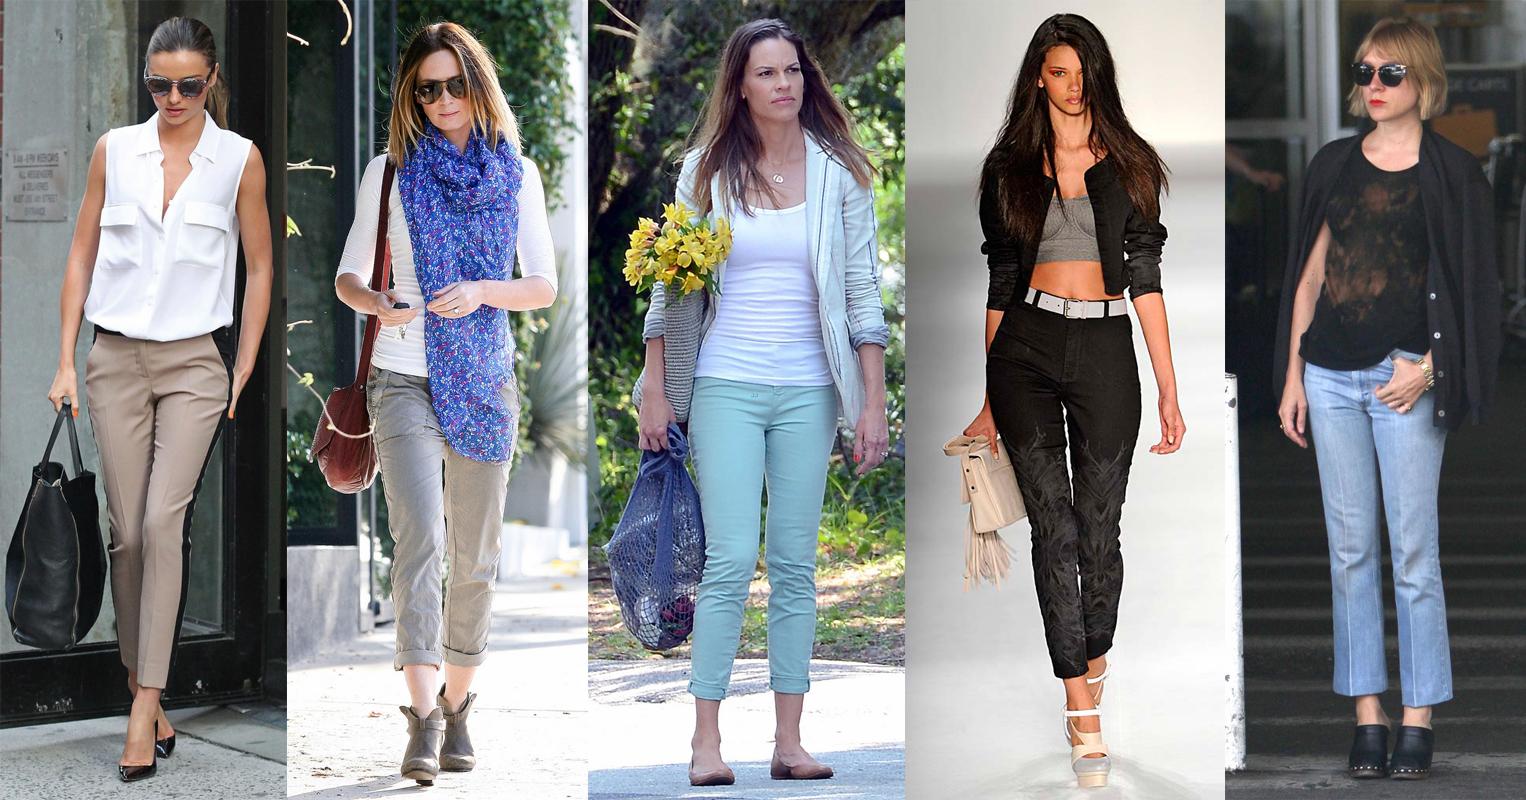 http://4.bp.blogspot.com/-SMsYoRZiwiM/UBXW-MxGdKI/AAAAAAAAA1w/MjMmA0z5vgA/s1600/Miranda+Kerr+-+Emily+Blunt+-+Hilary+Swank+Desfile+TNG+e+Chloe+Sevigny.jpg